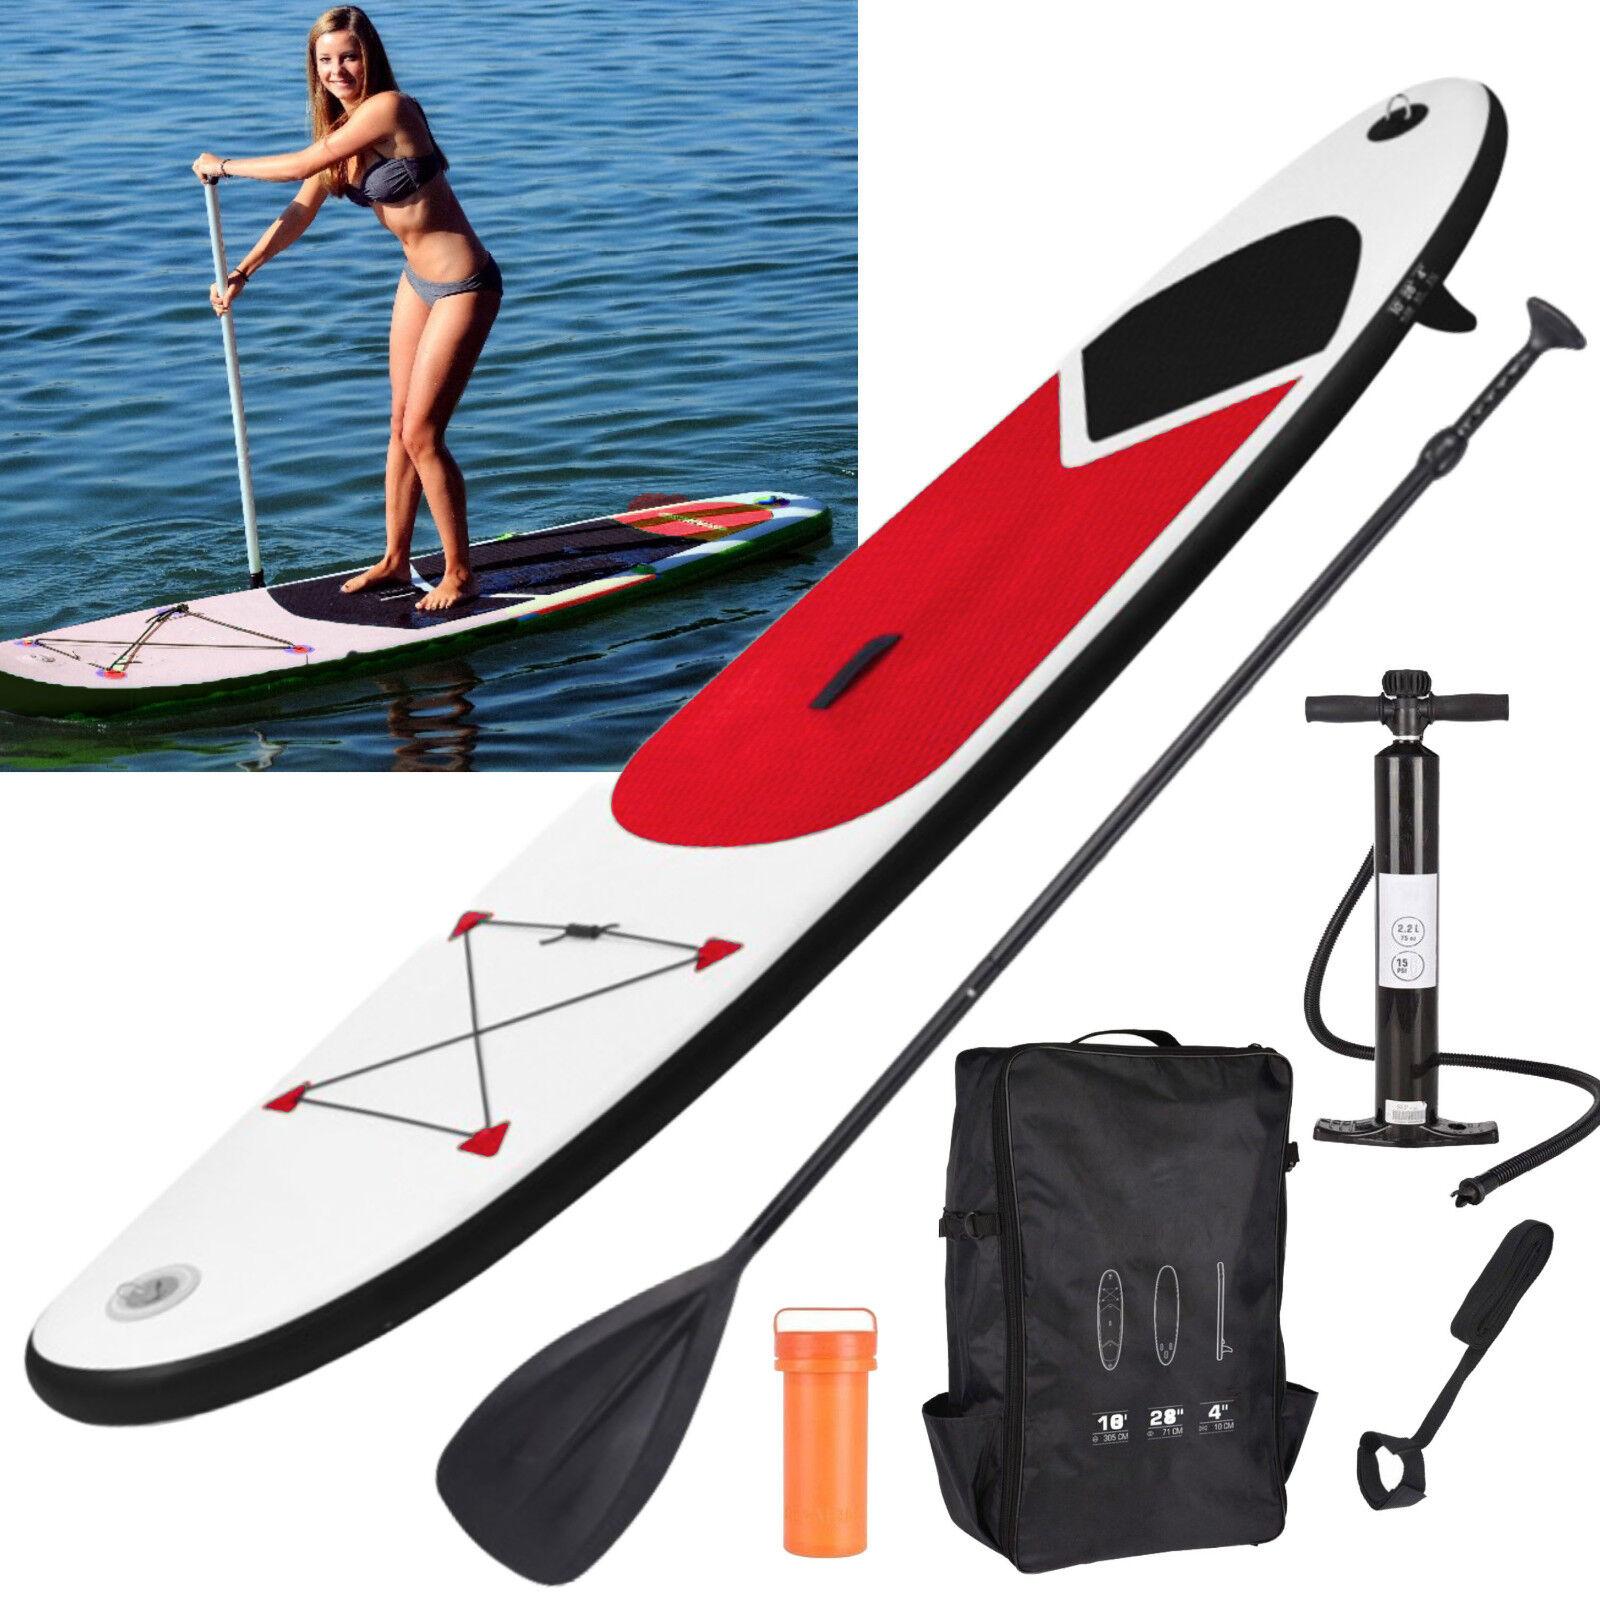 Paddle Board inflable SUP Tabla de Surf Stand Up Set Bomba Correa Bolso De Transporte 10FT